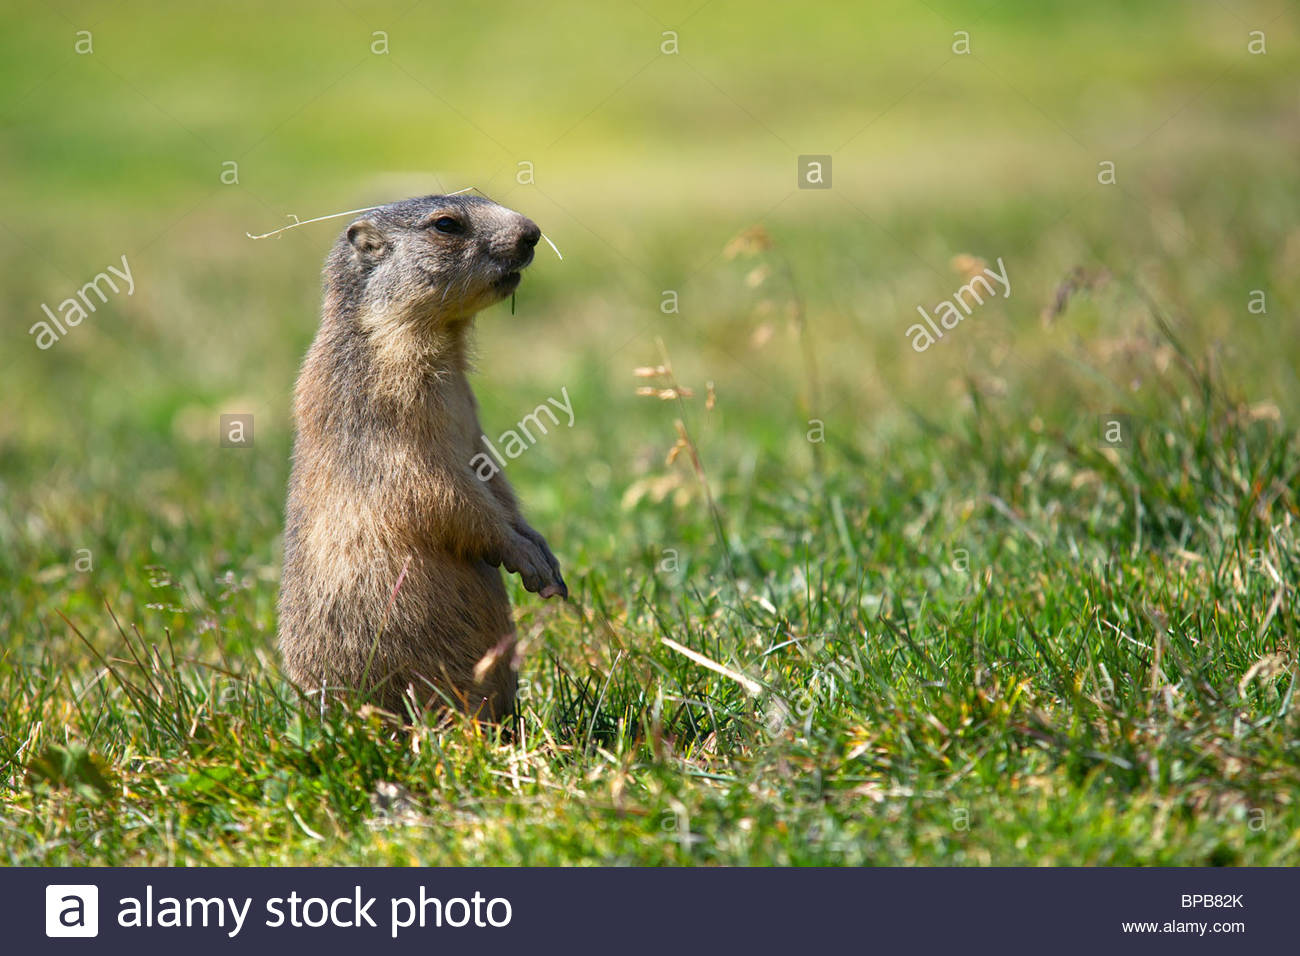 alpine-marmot-marmota-marmota-standing-w